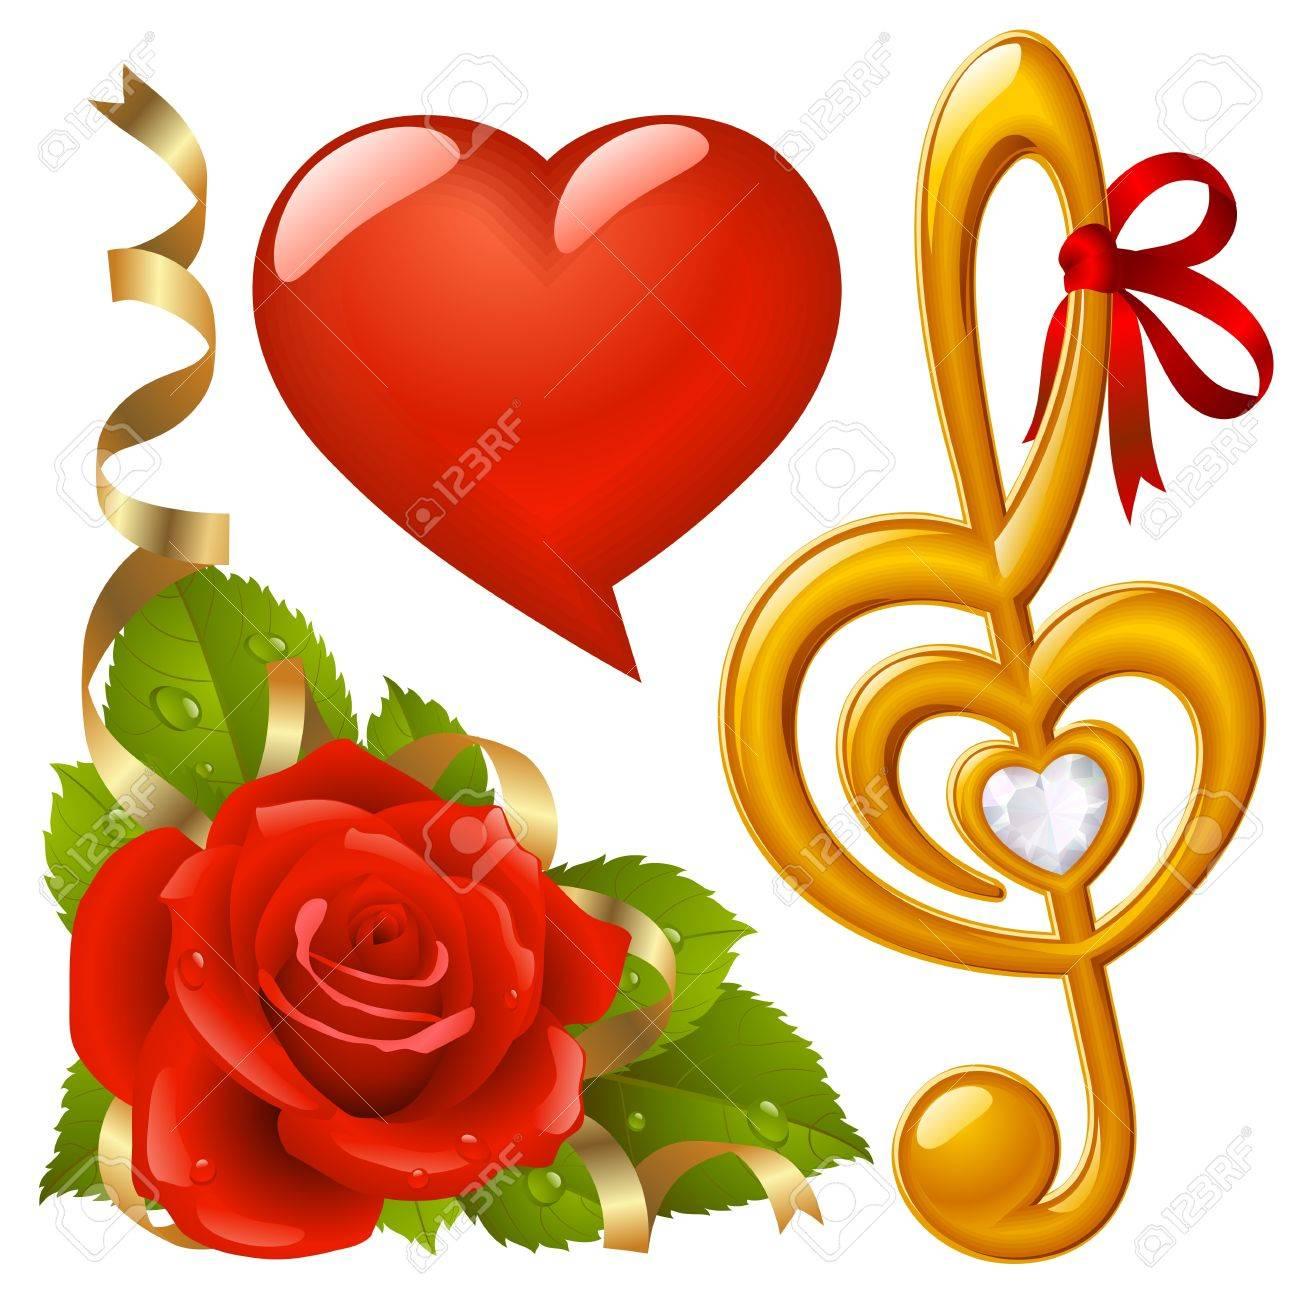 Valentines Day set 3 Stock Vector - 11961772